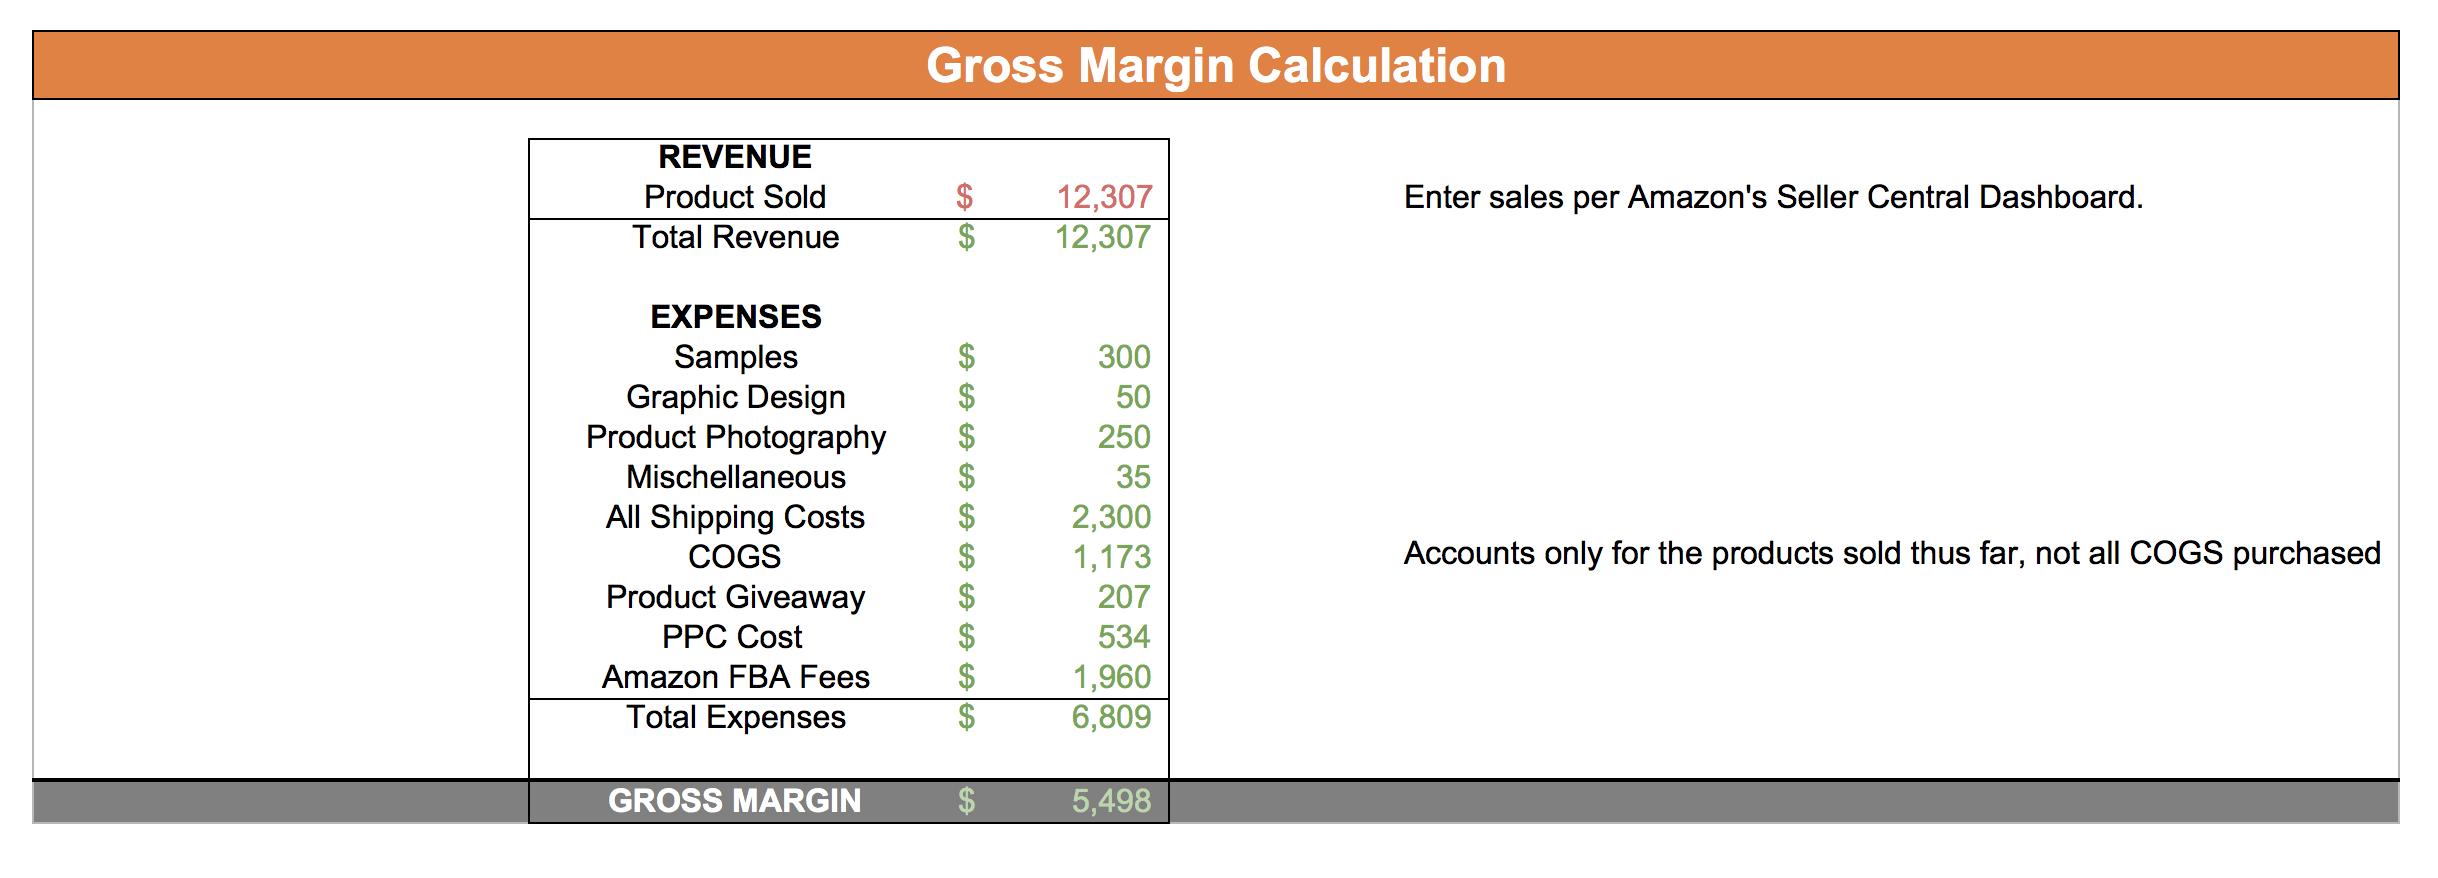 Free Amazon Fba Calculator